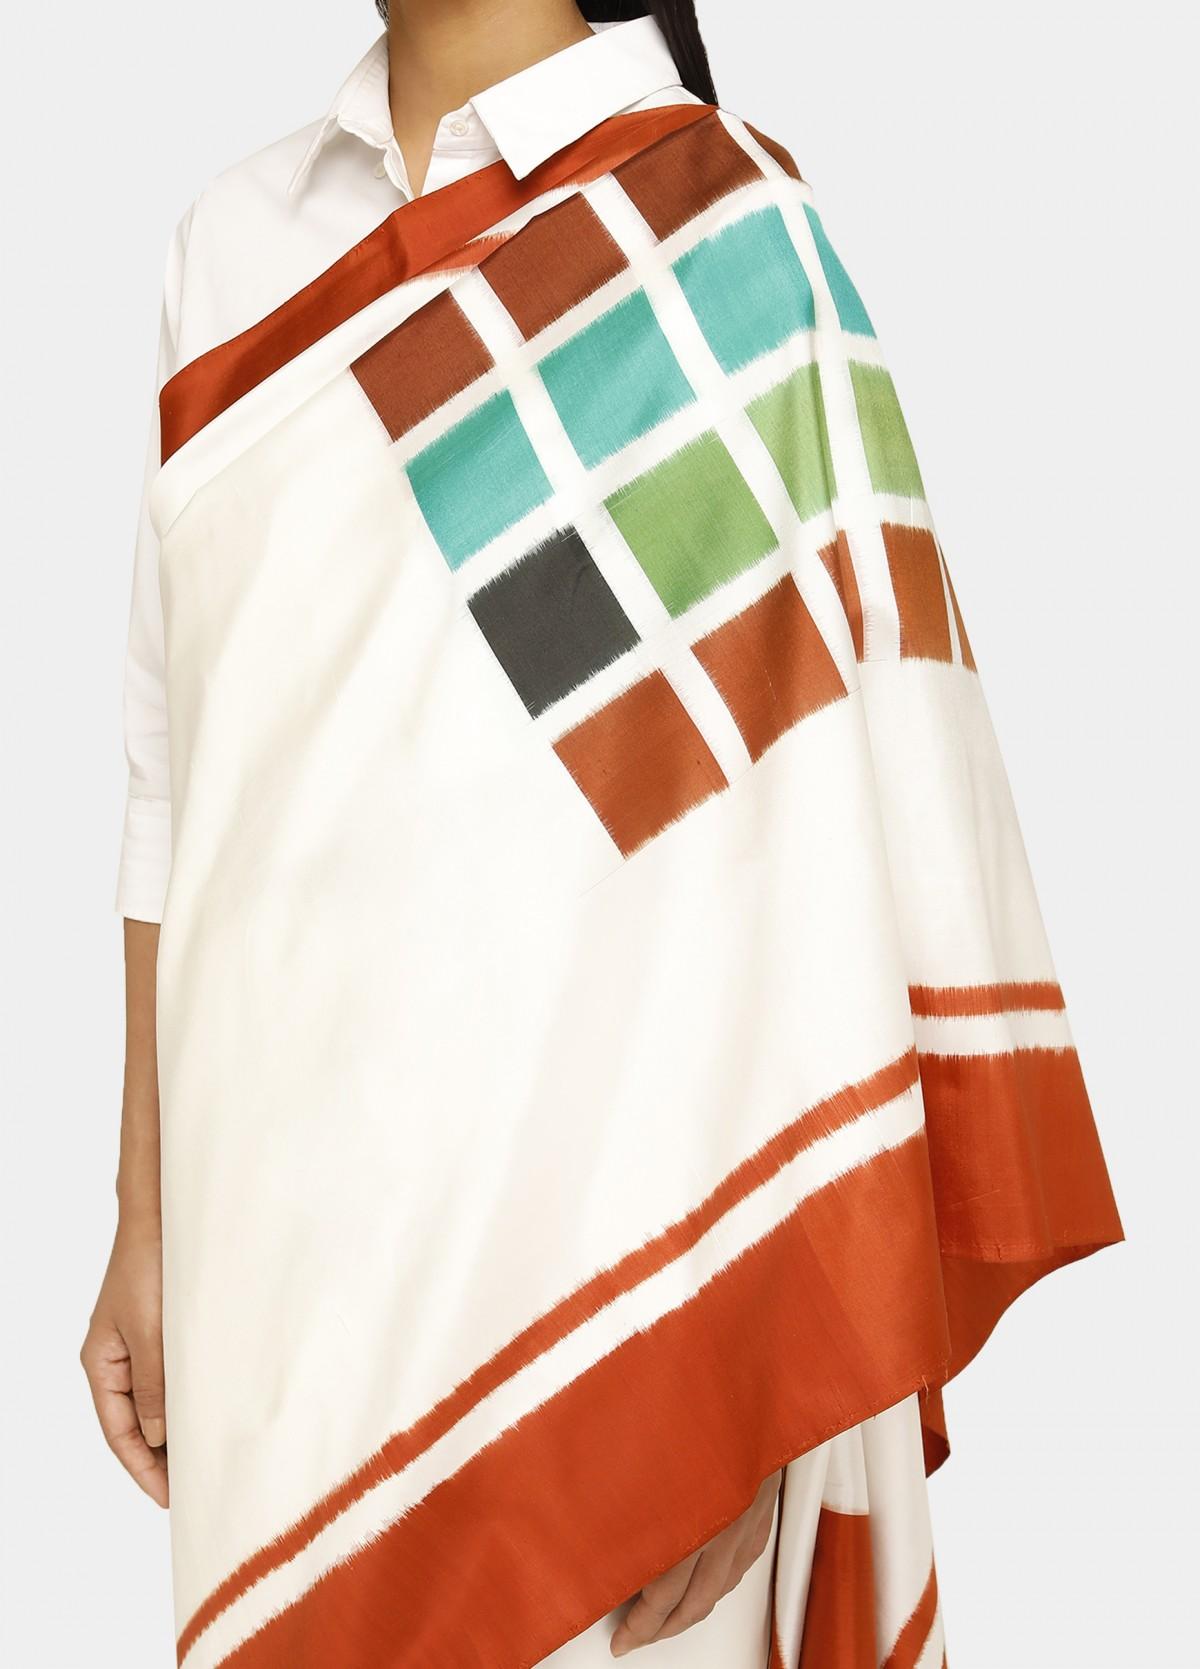 The Blanket Sari